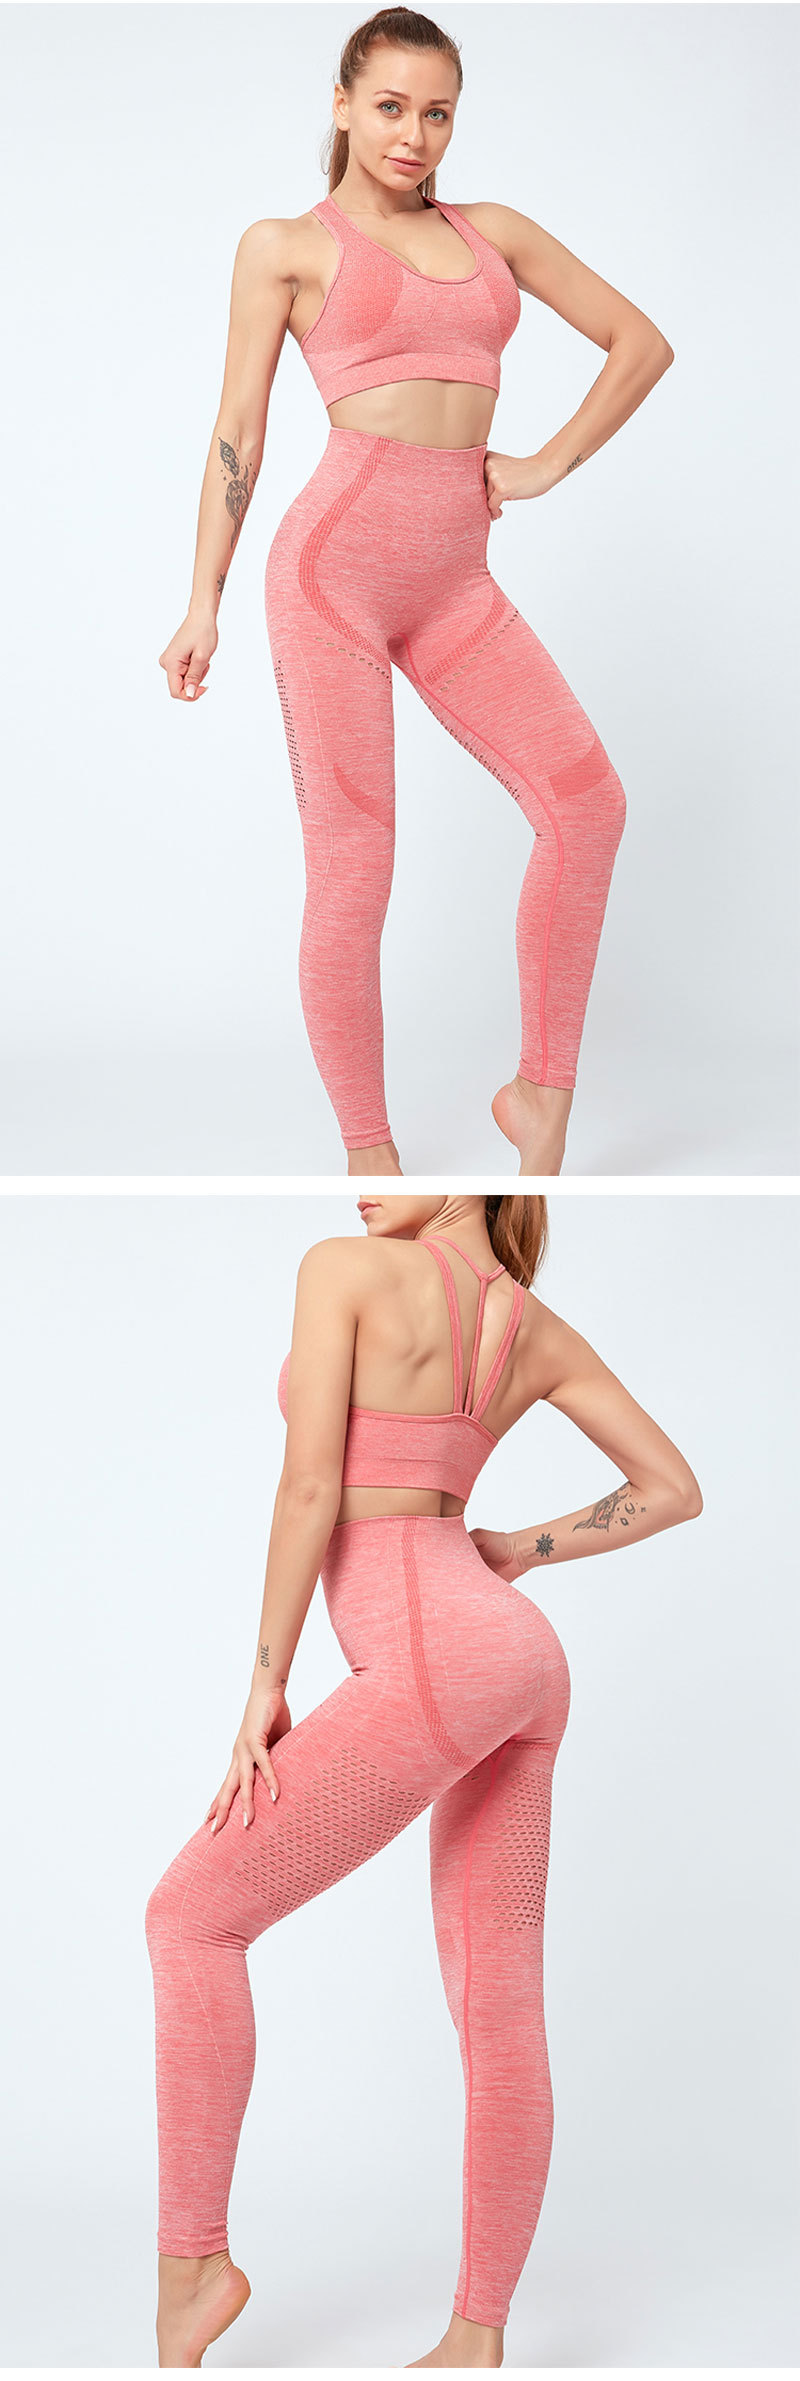 feminino vestuário fitness jogging conjuntos treino